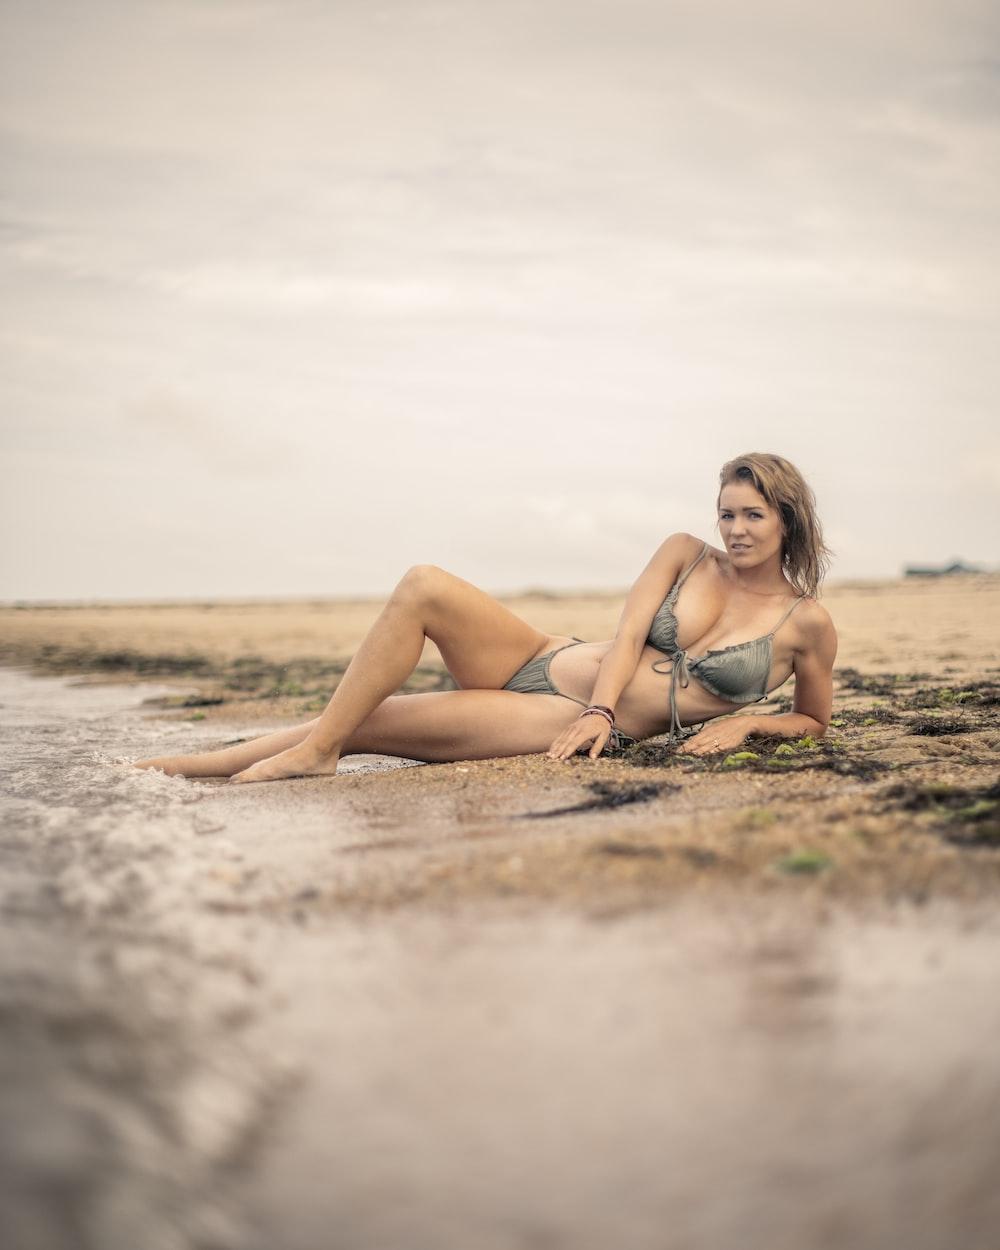 woman in black bikini lying on sand during daytime